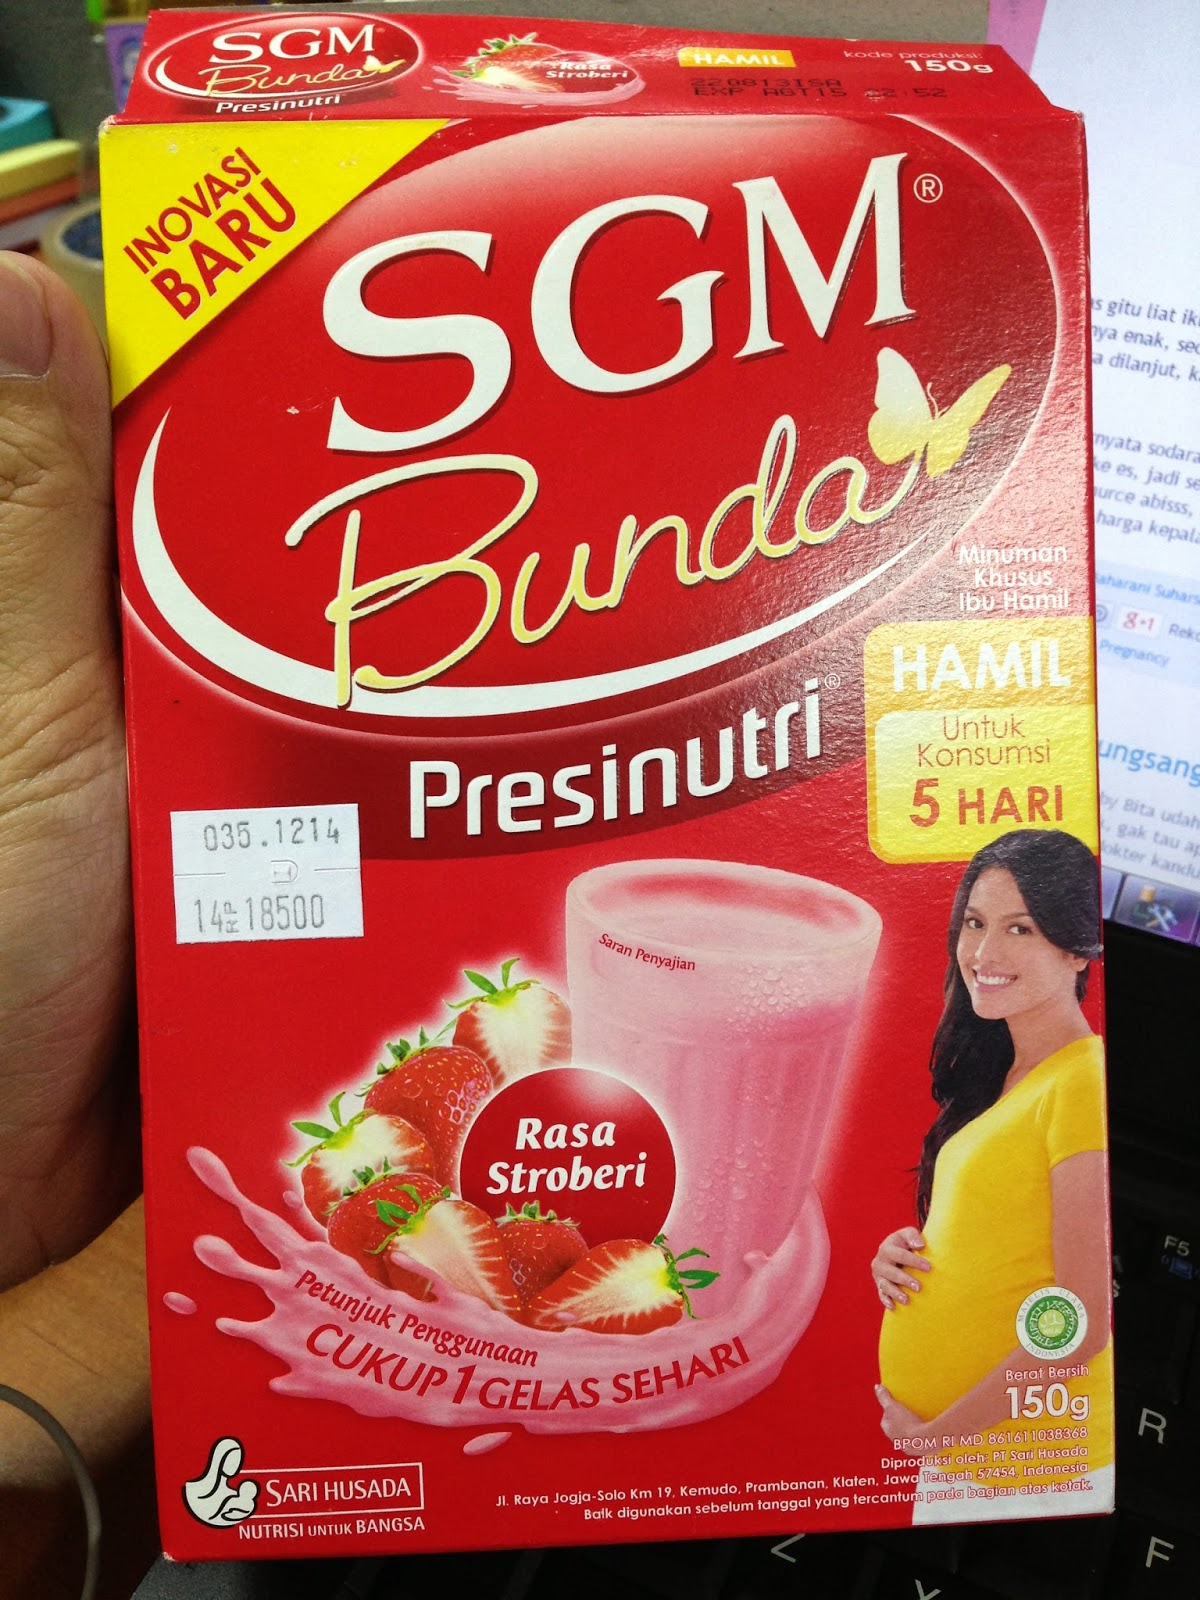 Susu SGM dan